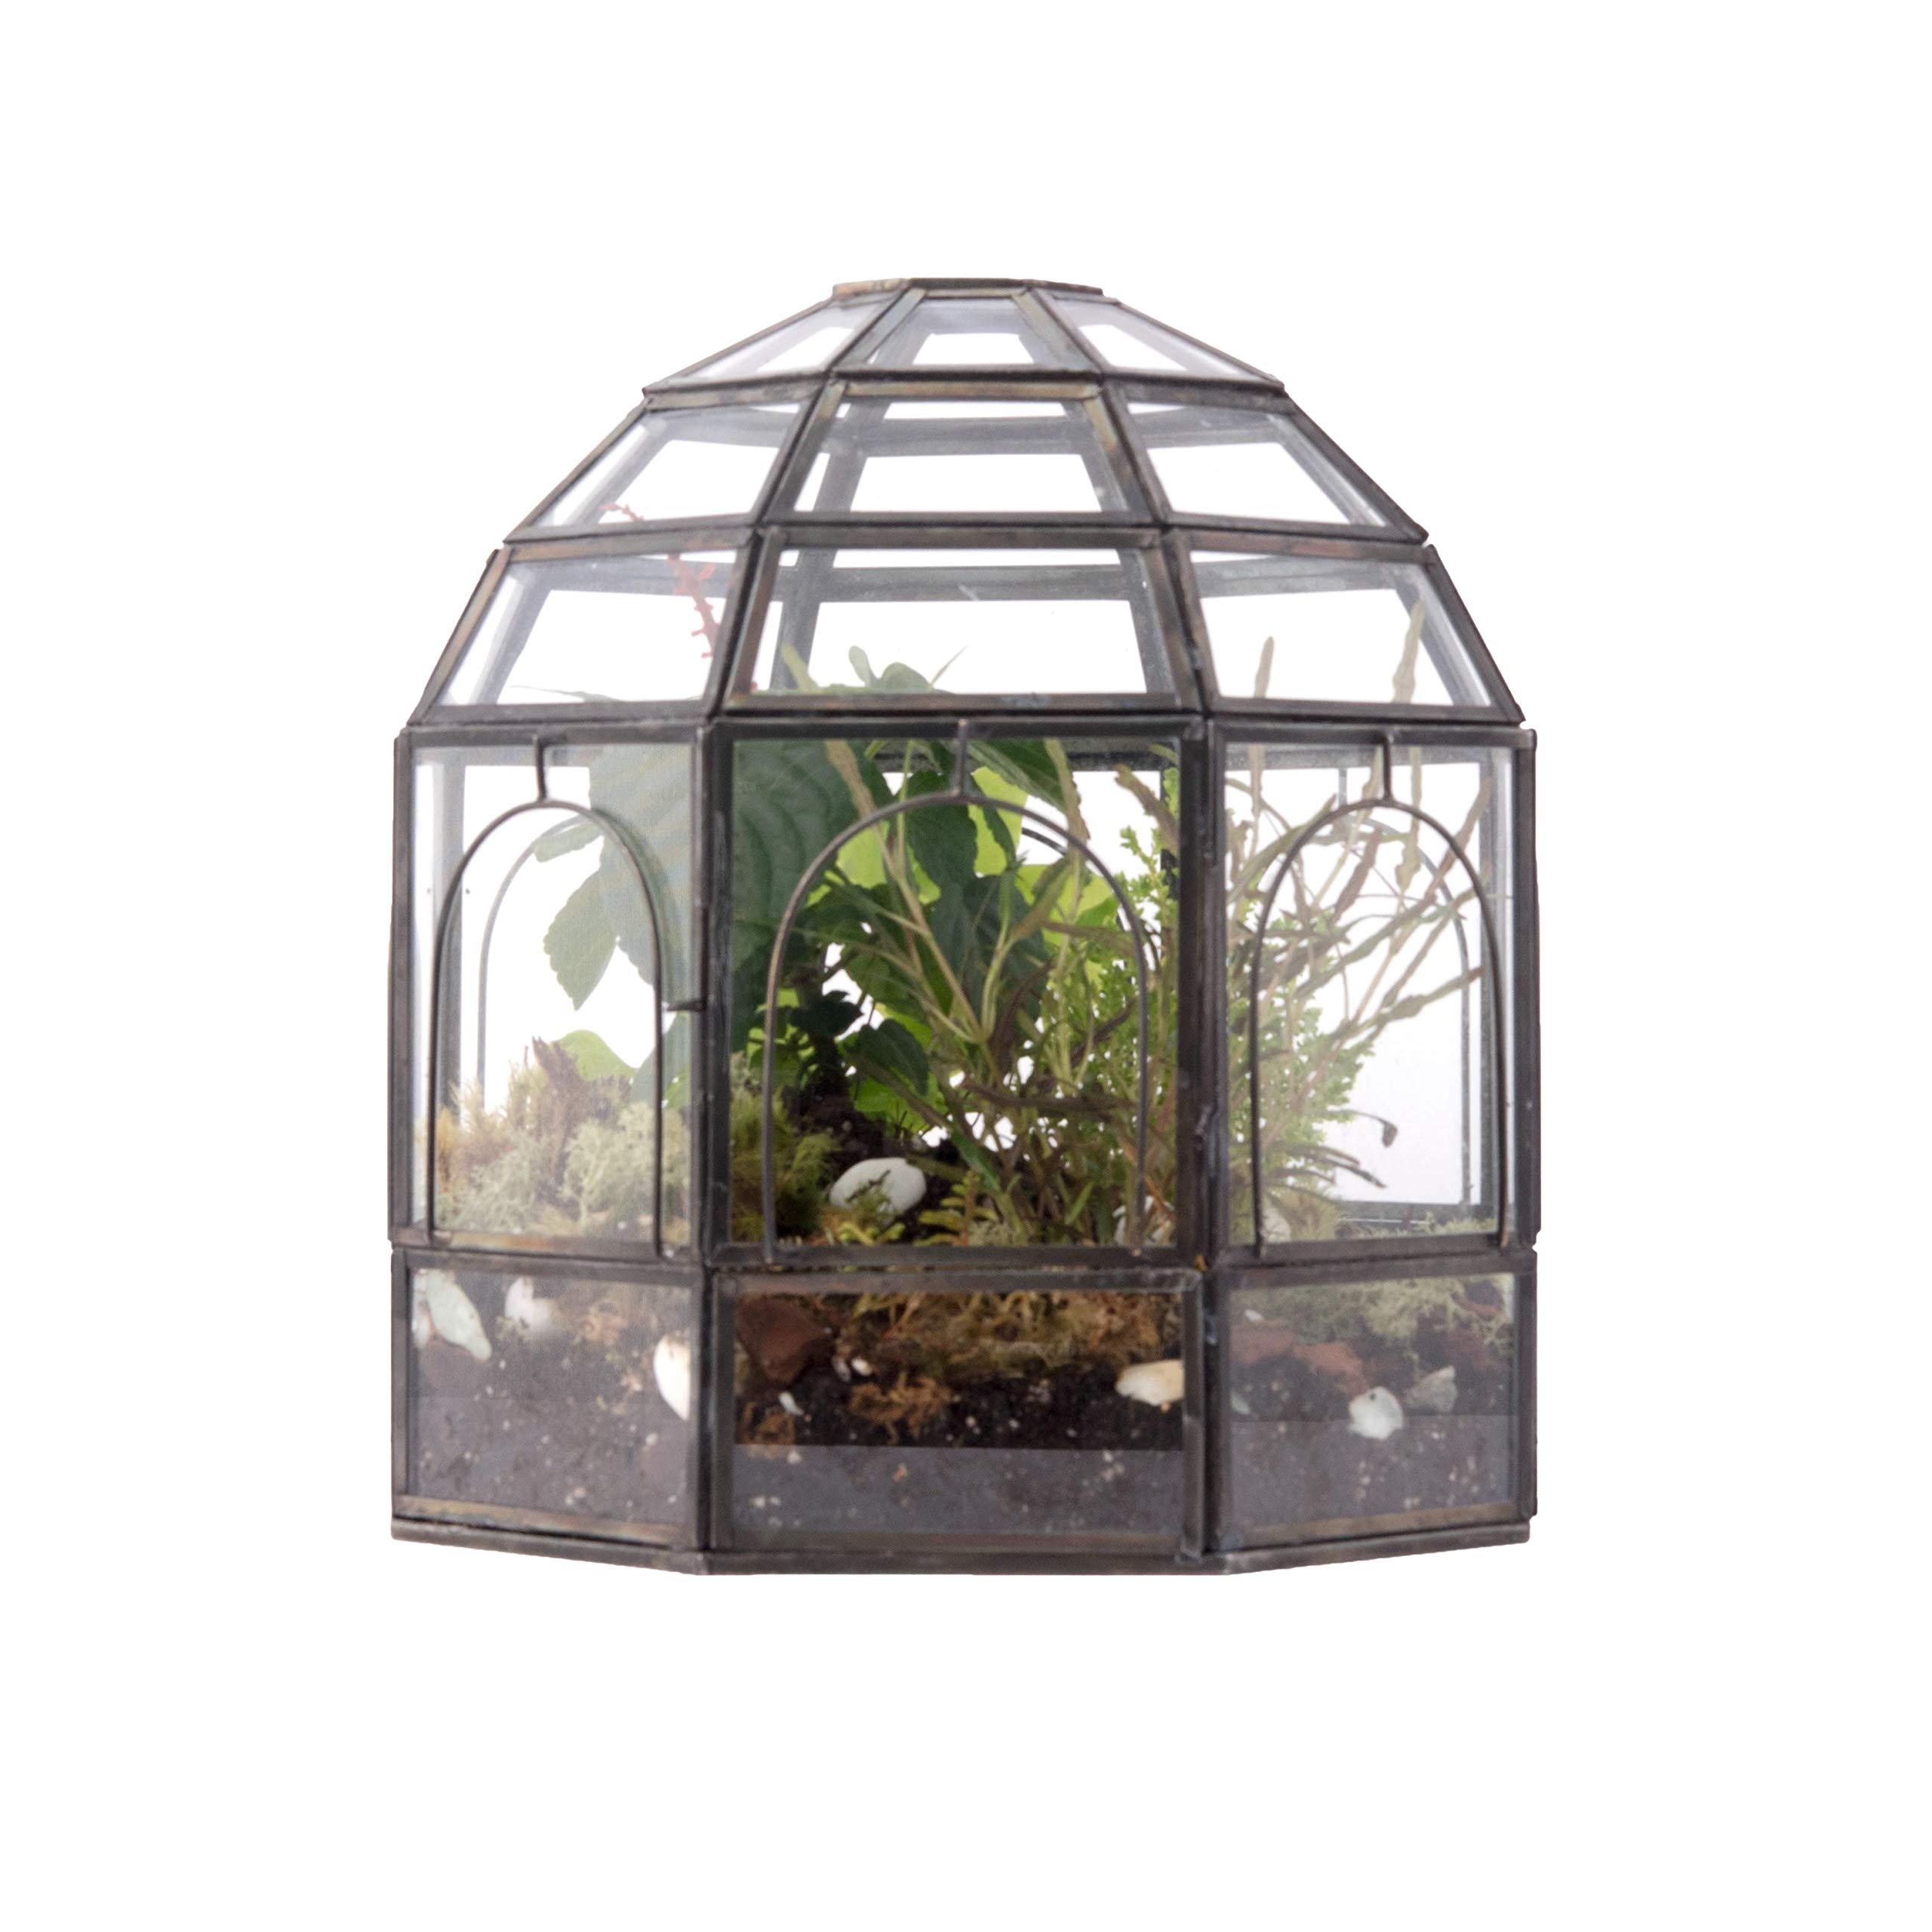 "Urban Born- Handmade Glass Terrarium, Birdcage- 9''x9''x10"""